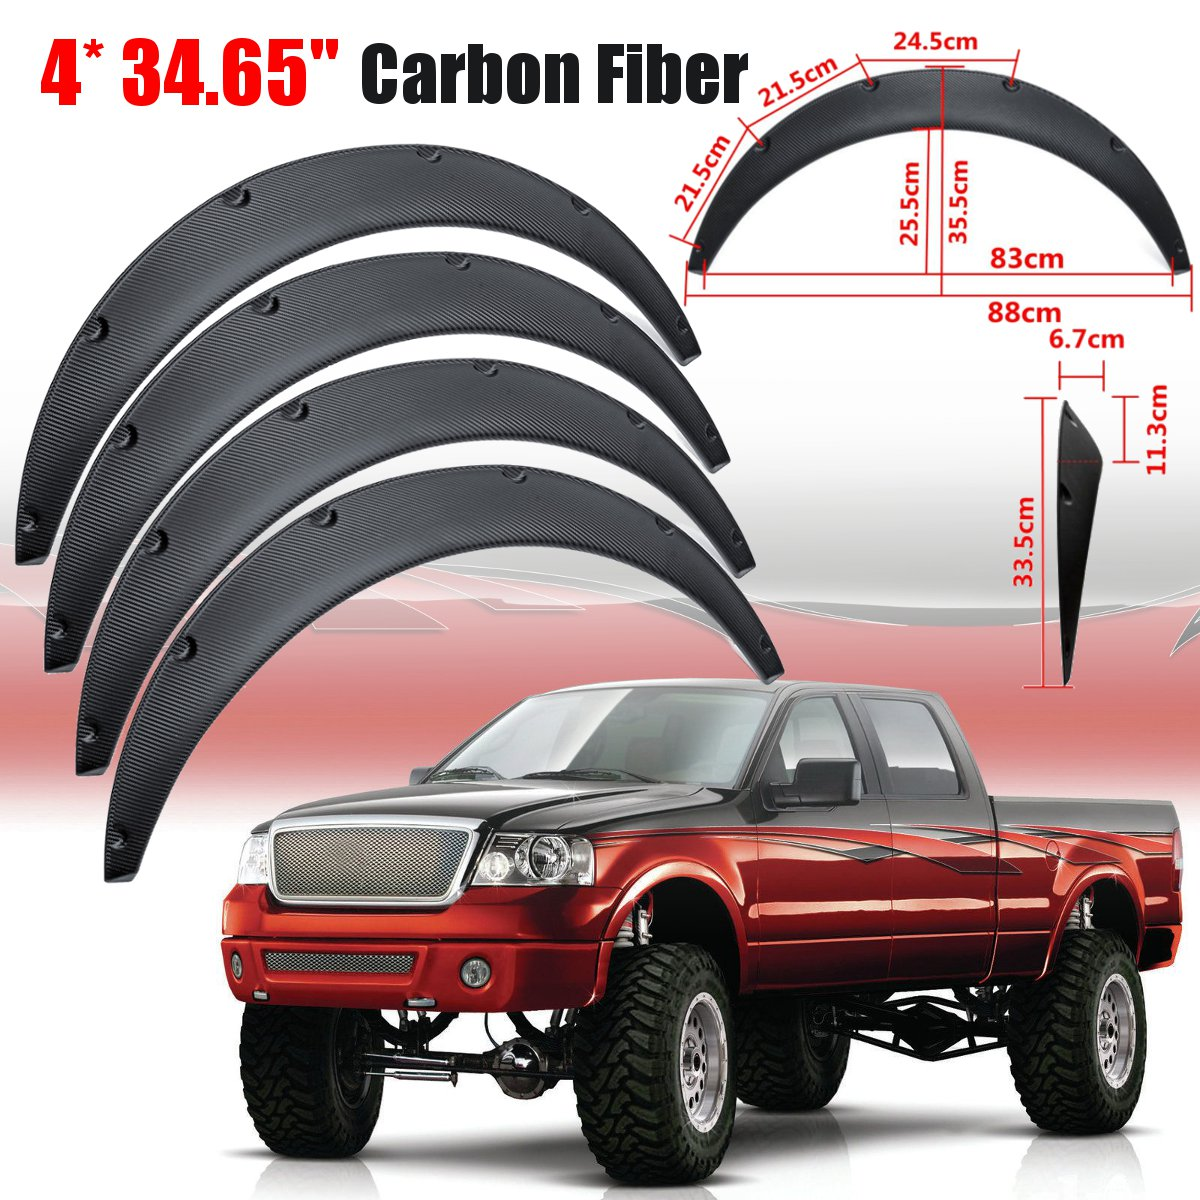 4Pcs Universal Flexible Car Body For Fender Flares Extension Wide Wheel Arches Car Mudguards For SUVs Car 88cm/34.65